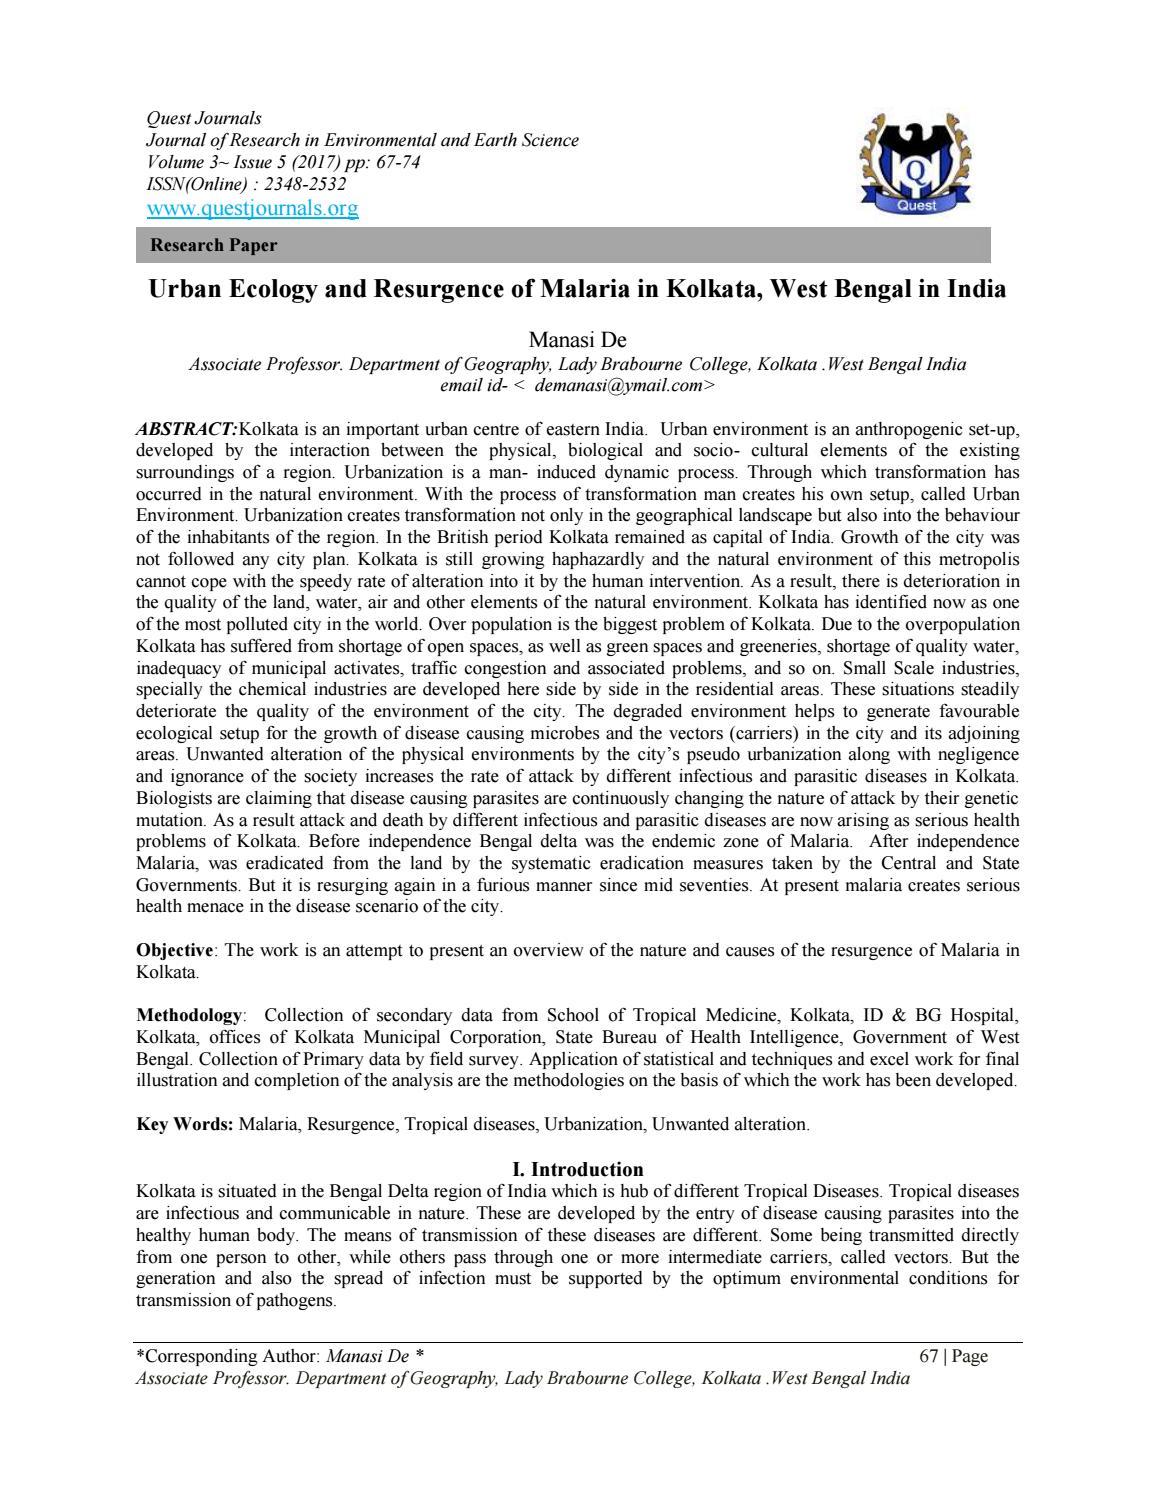 Urban Ecology and Resurgence of Malaria in Kolkata, West